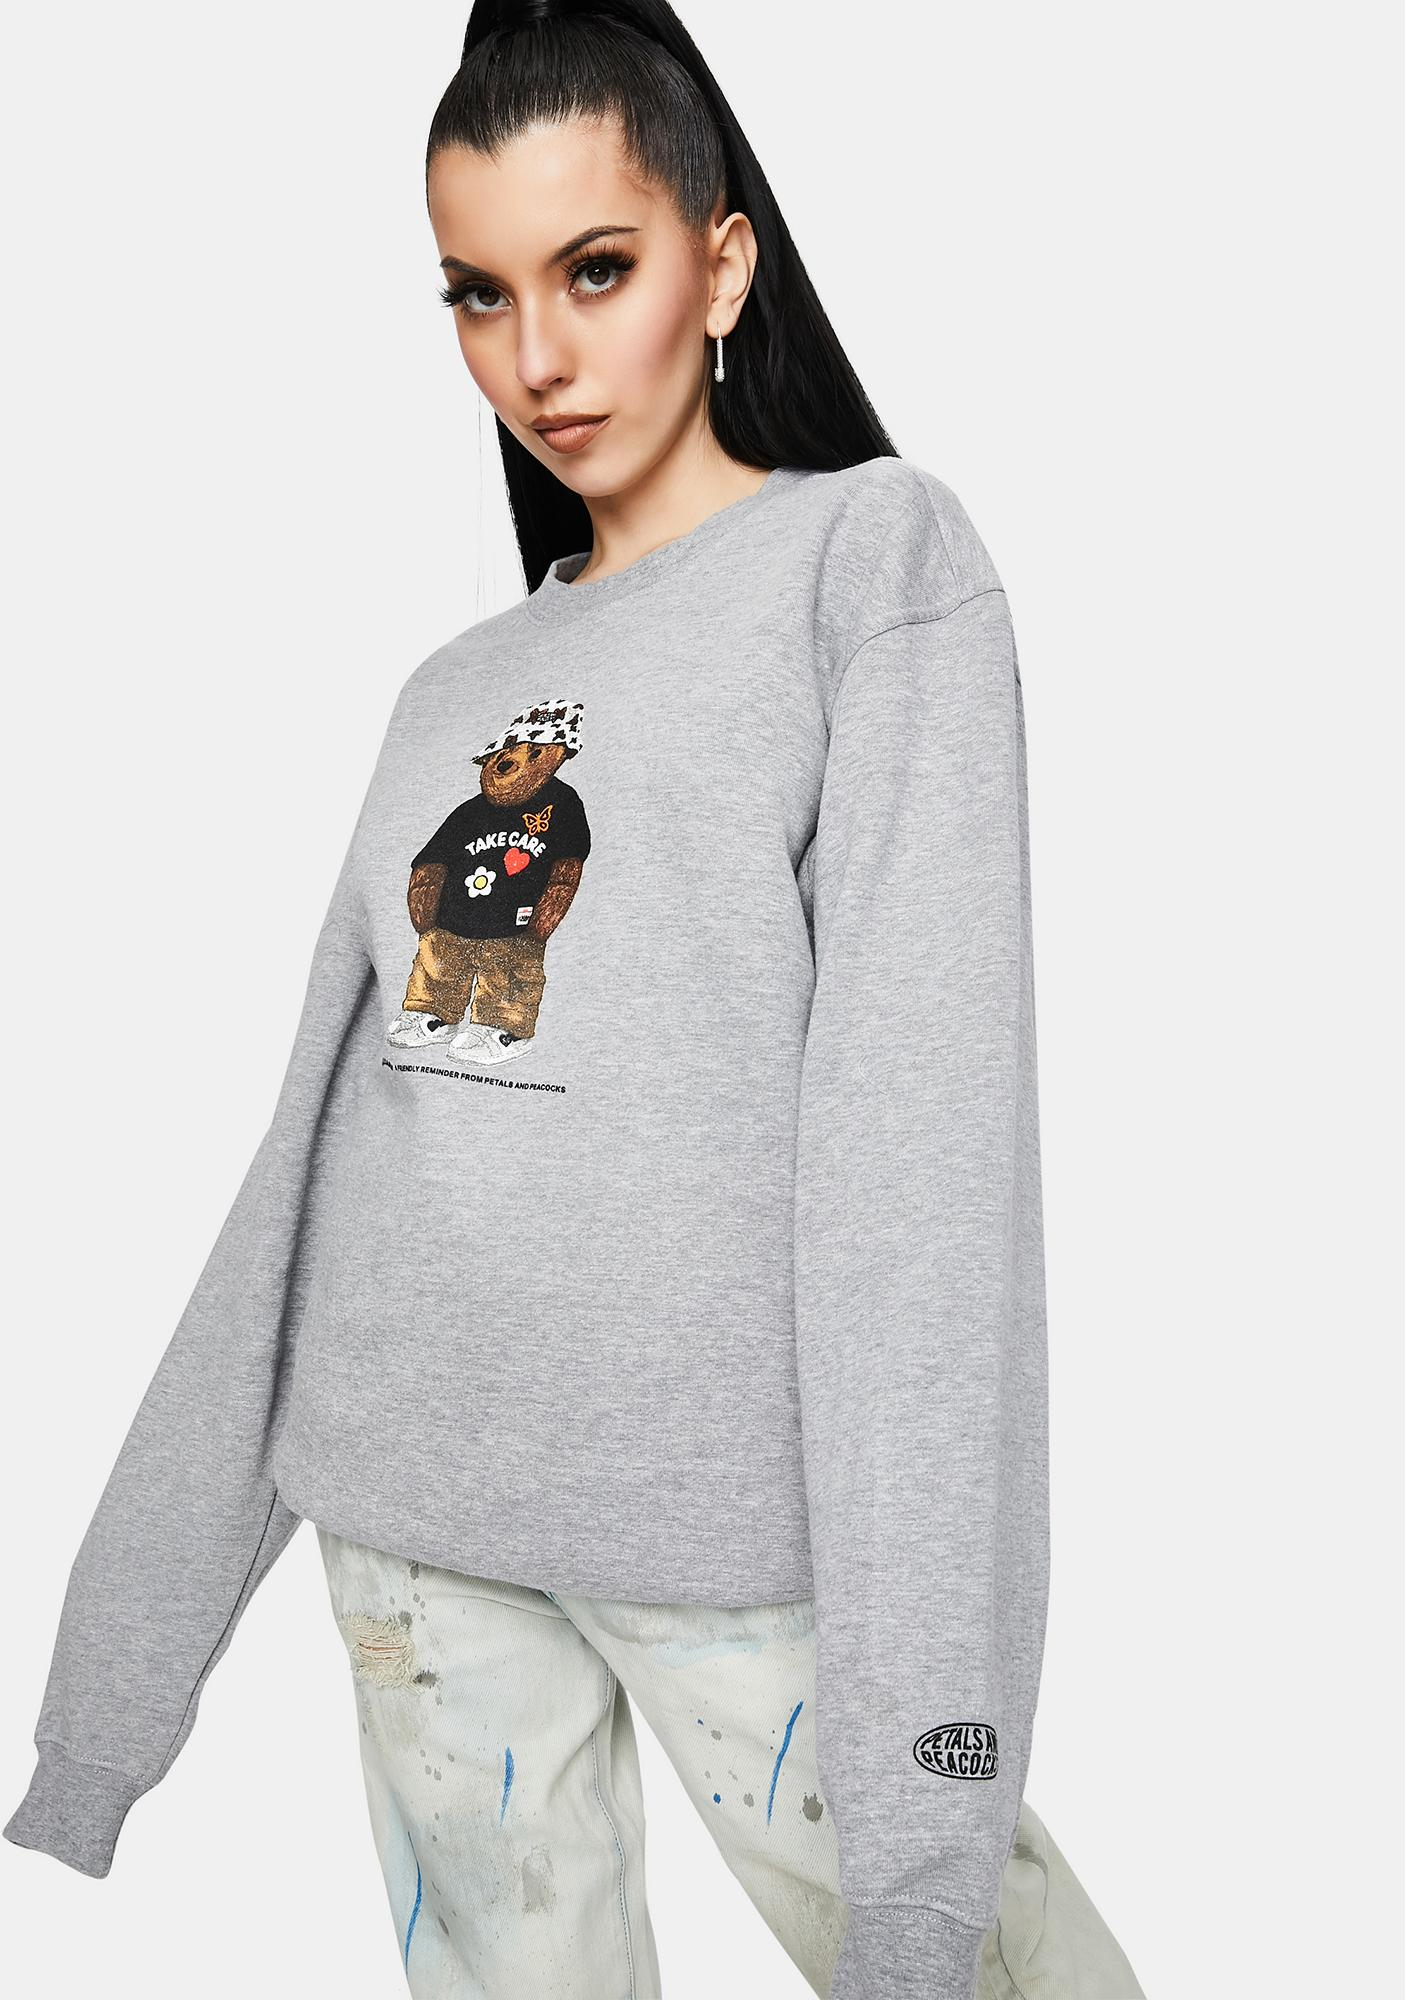 Petals and Peacocks Take Care Bear Graphic Sweatshirt